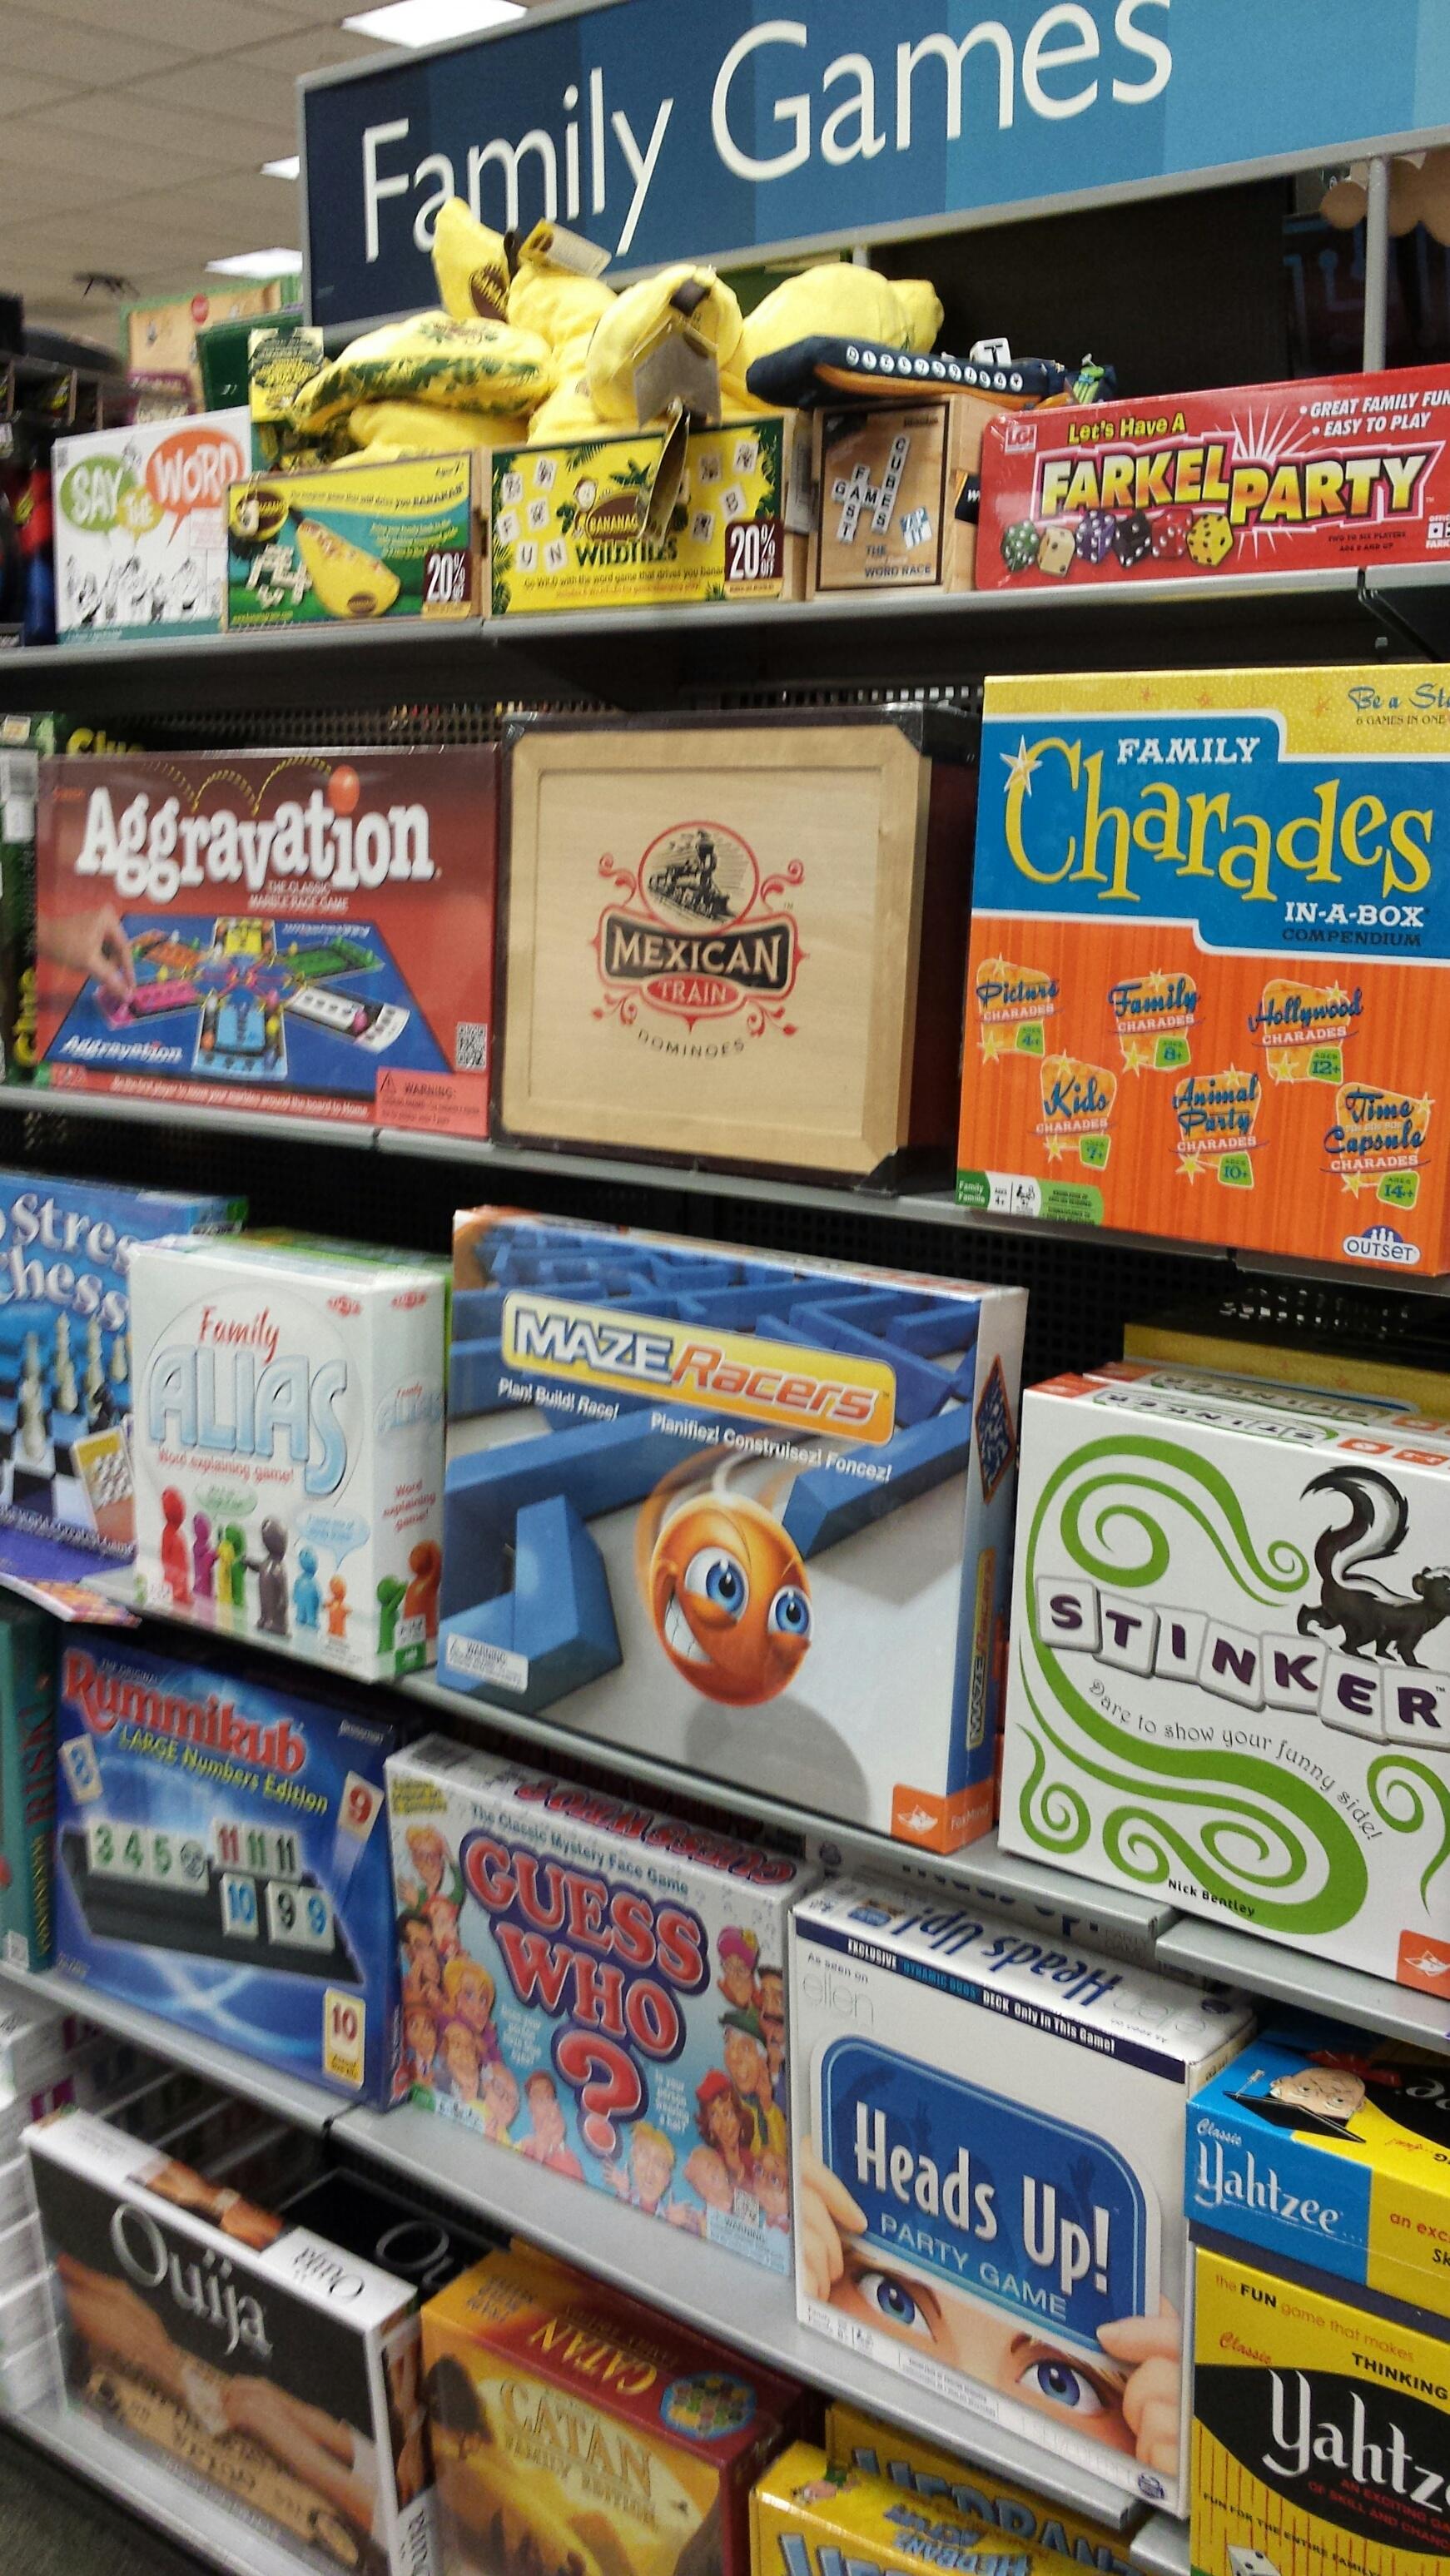 Maze Racers on barnes & noble store shelves